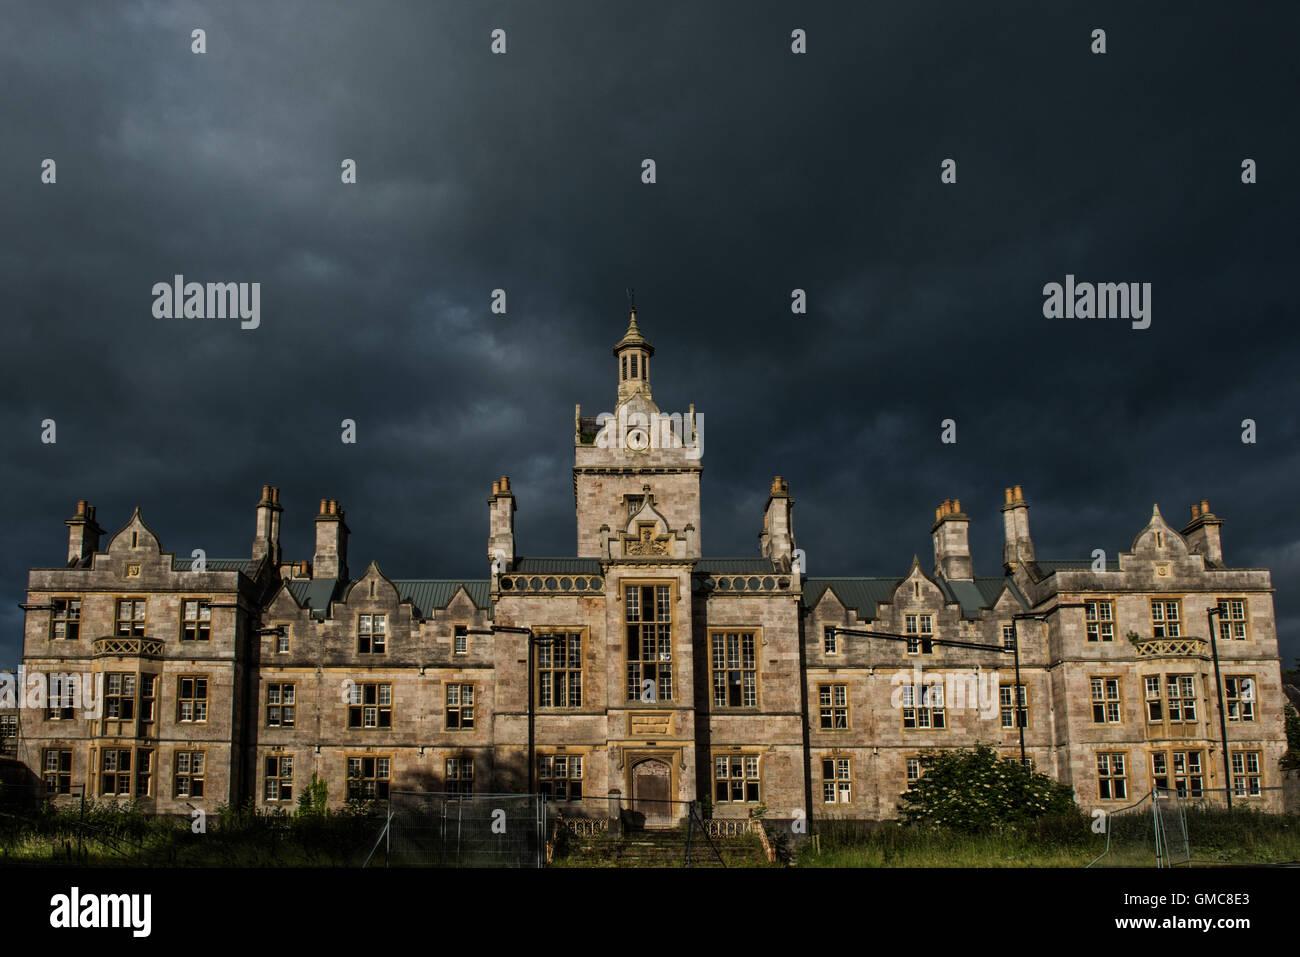 Stormy sky over the imposing Denbigh Asylum, Denbigh, Denbighshire, Wales, UK - Stock Image